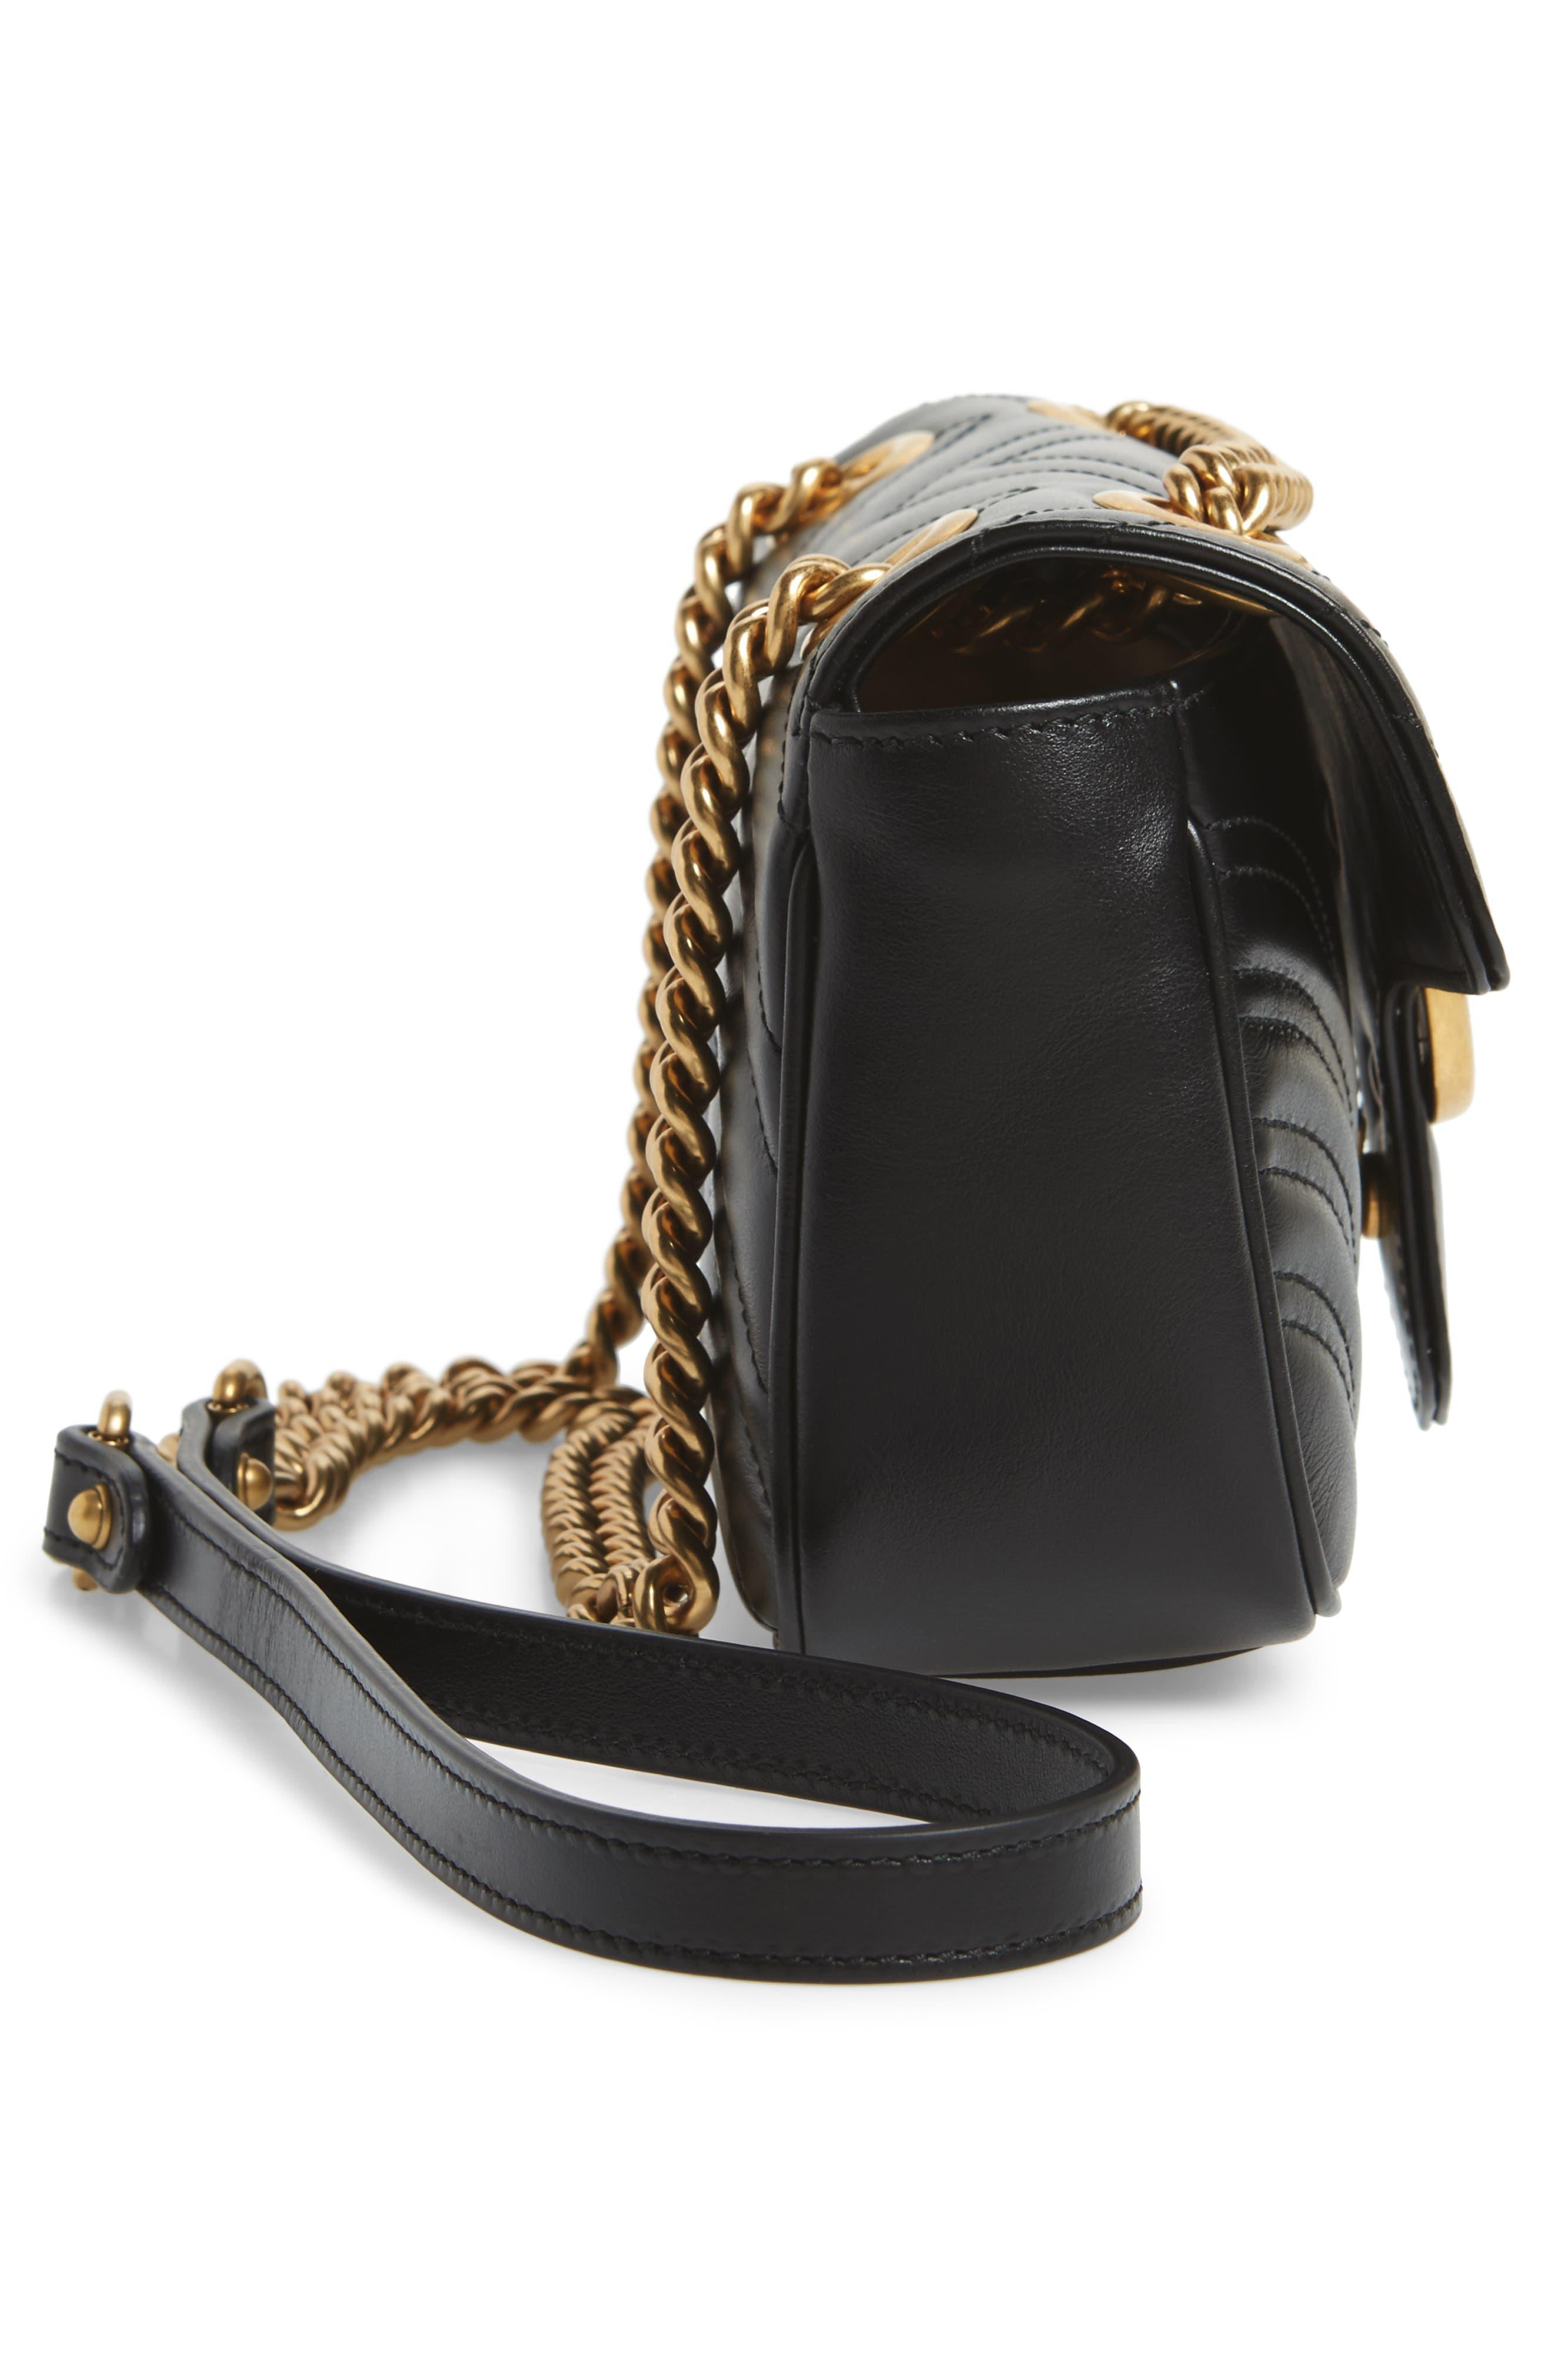 Mini GG Marmont 2.0 Matelassé Leather Shoulder Bag,                             Alternate thumbnail 5, color,                             Nero